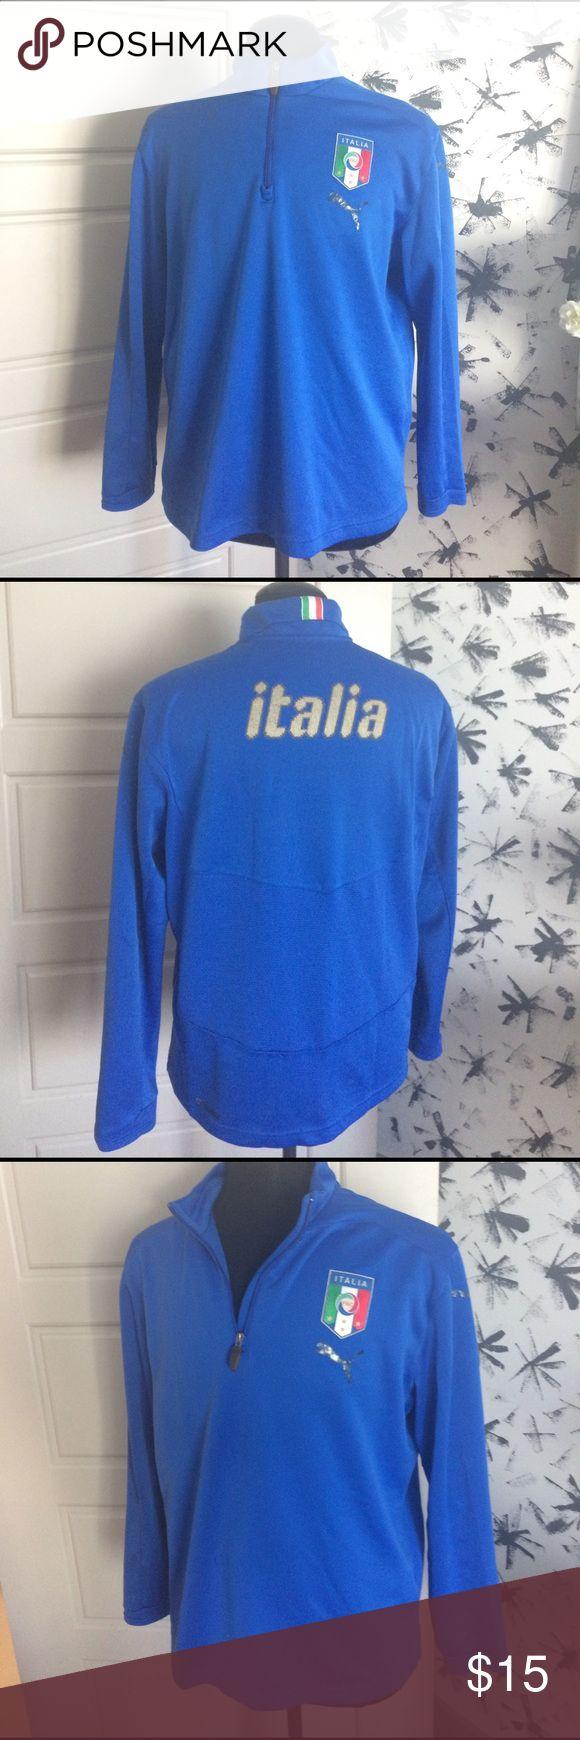 MENS PUMA ITALIA PULL OVER Men's blue puma pullover with italia on back-used condition Puma Shirts Sweatshirts & Hoodies